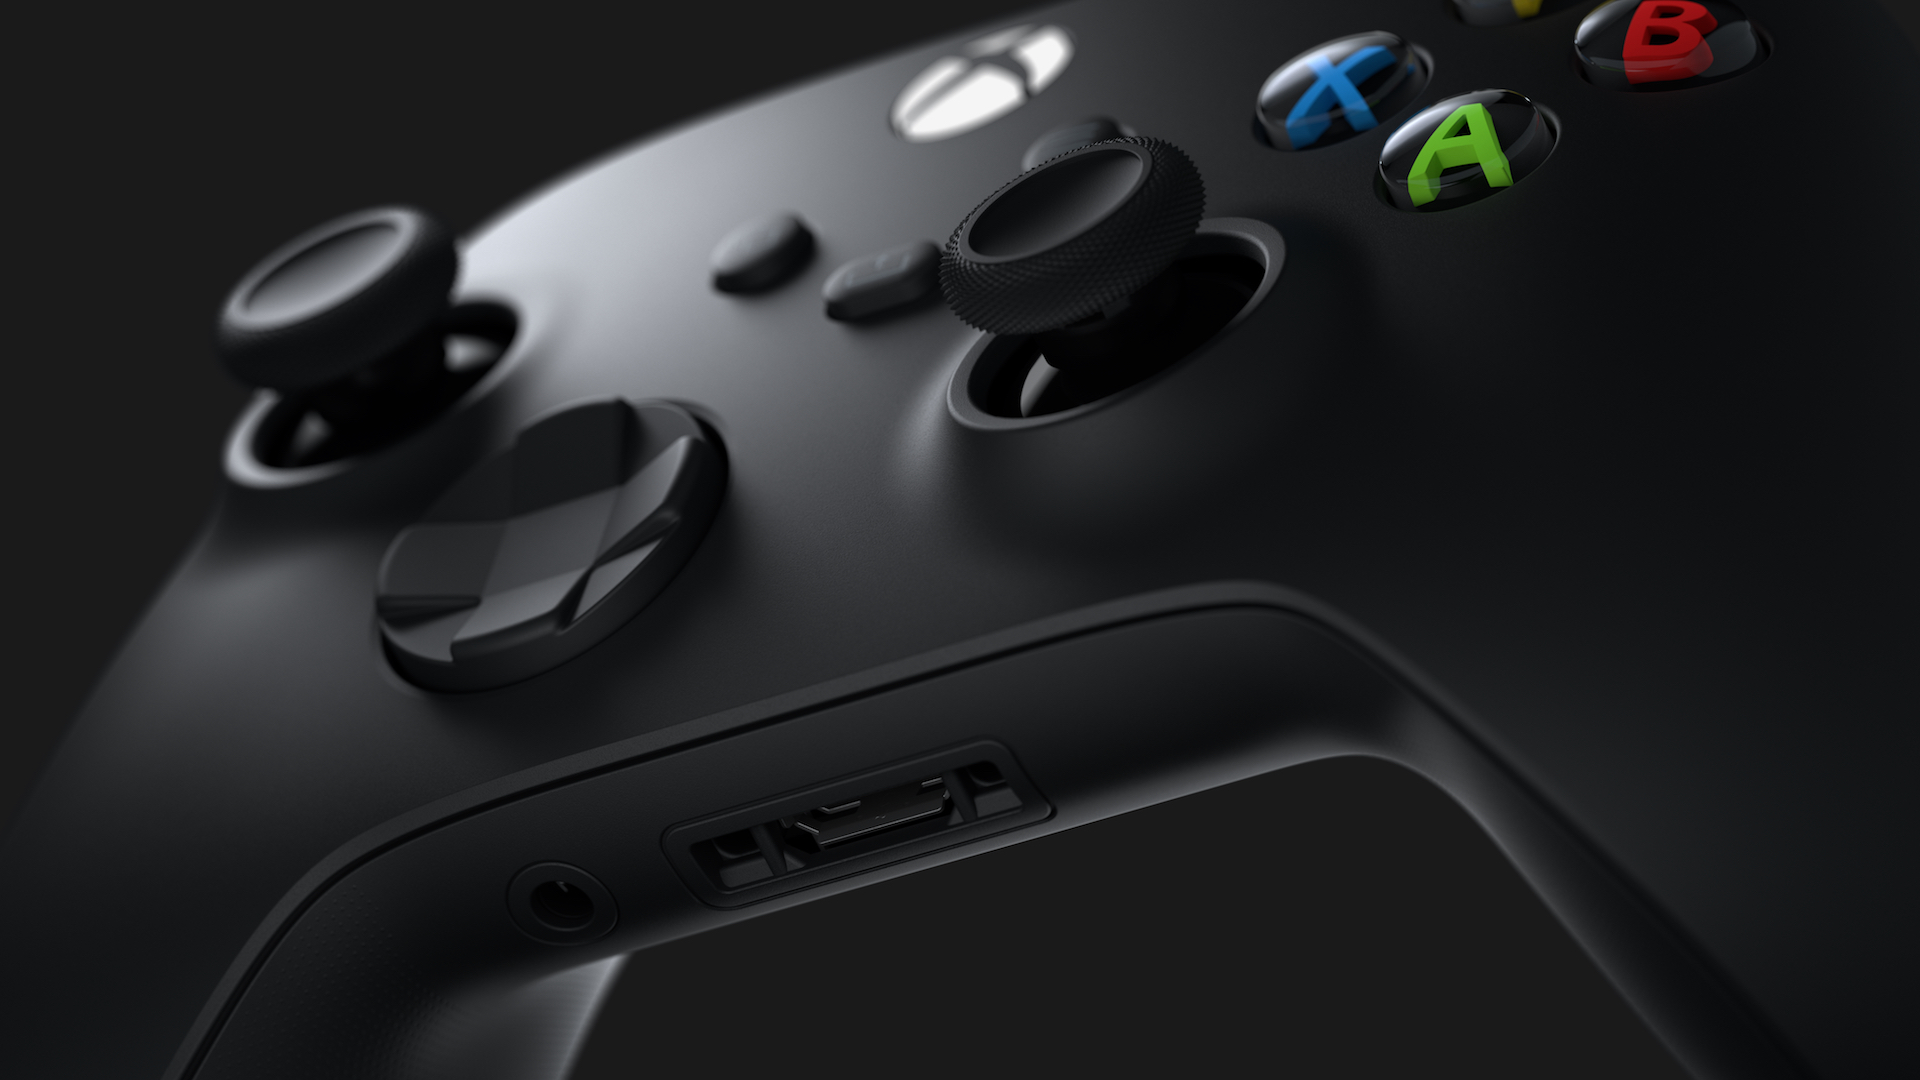 Xbox Series X shortages may last until April 2021